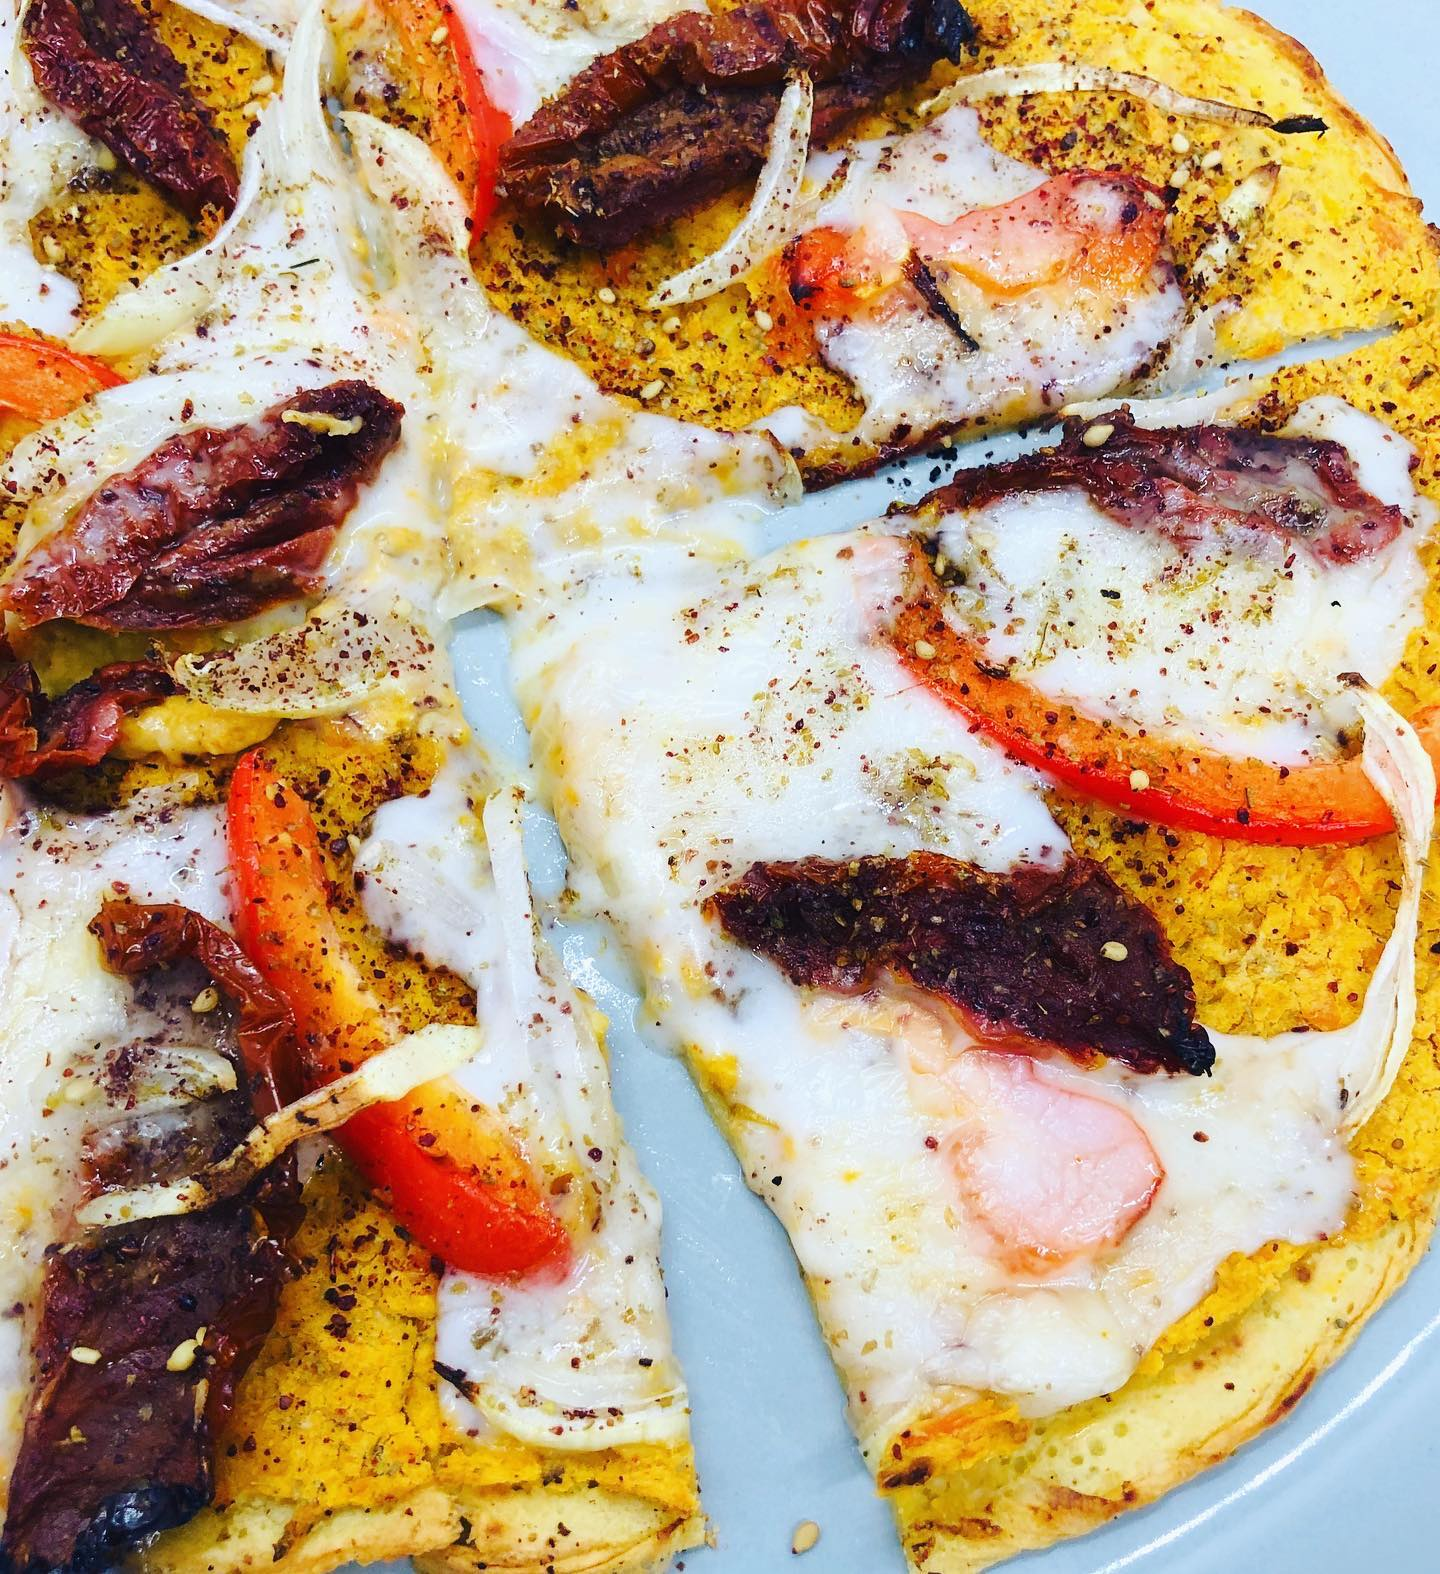 Quick & Easy Gluten-Free Vegan Feta Cheese Pizza